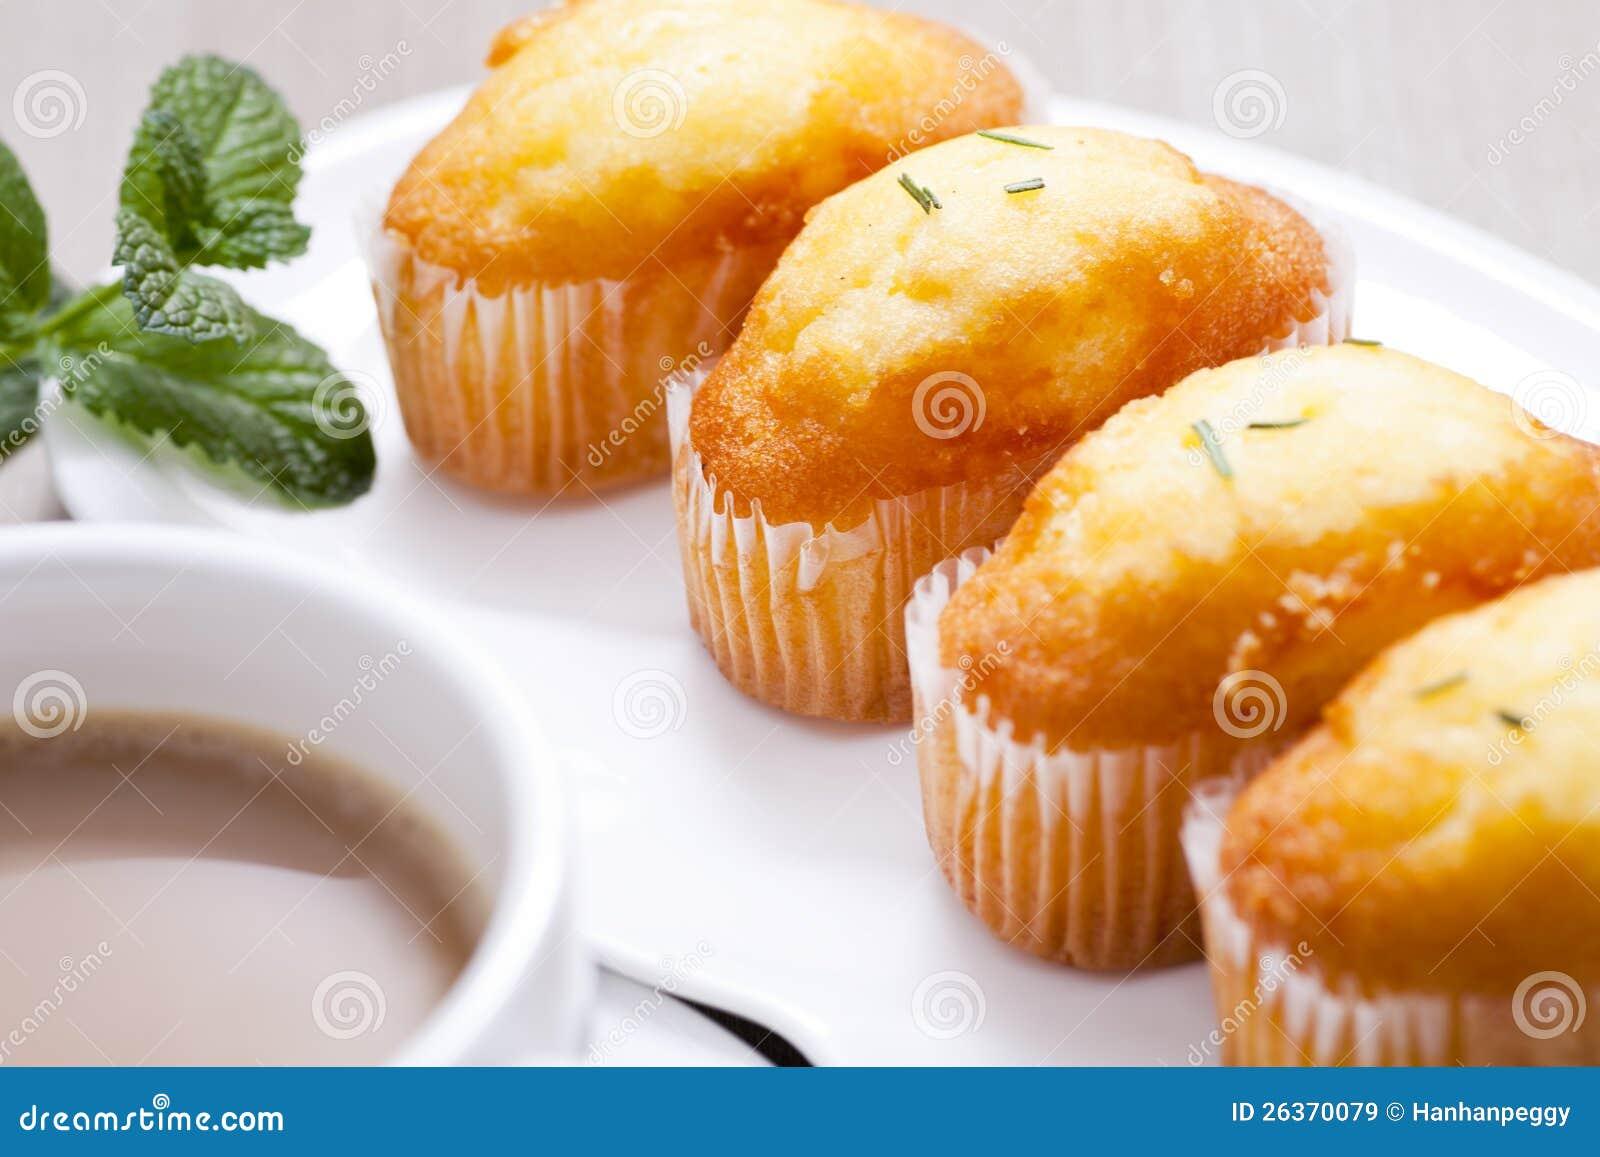 Muffinkuchen